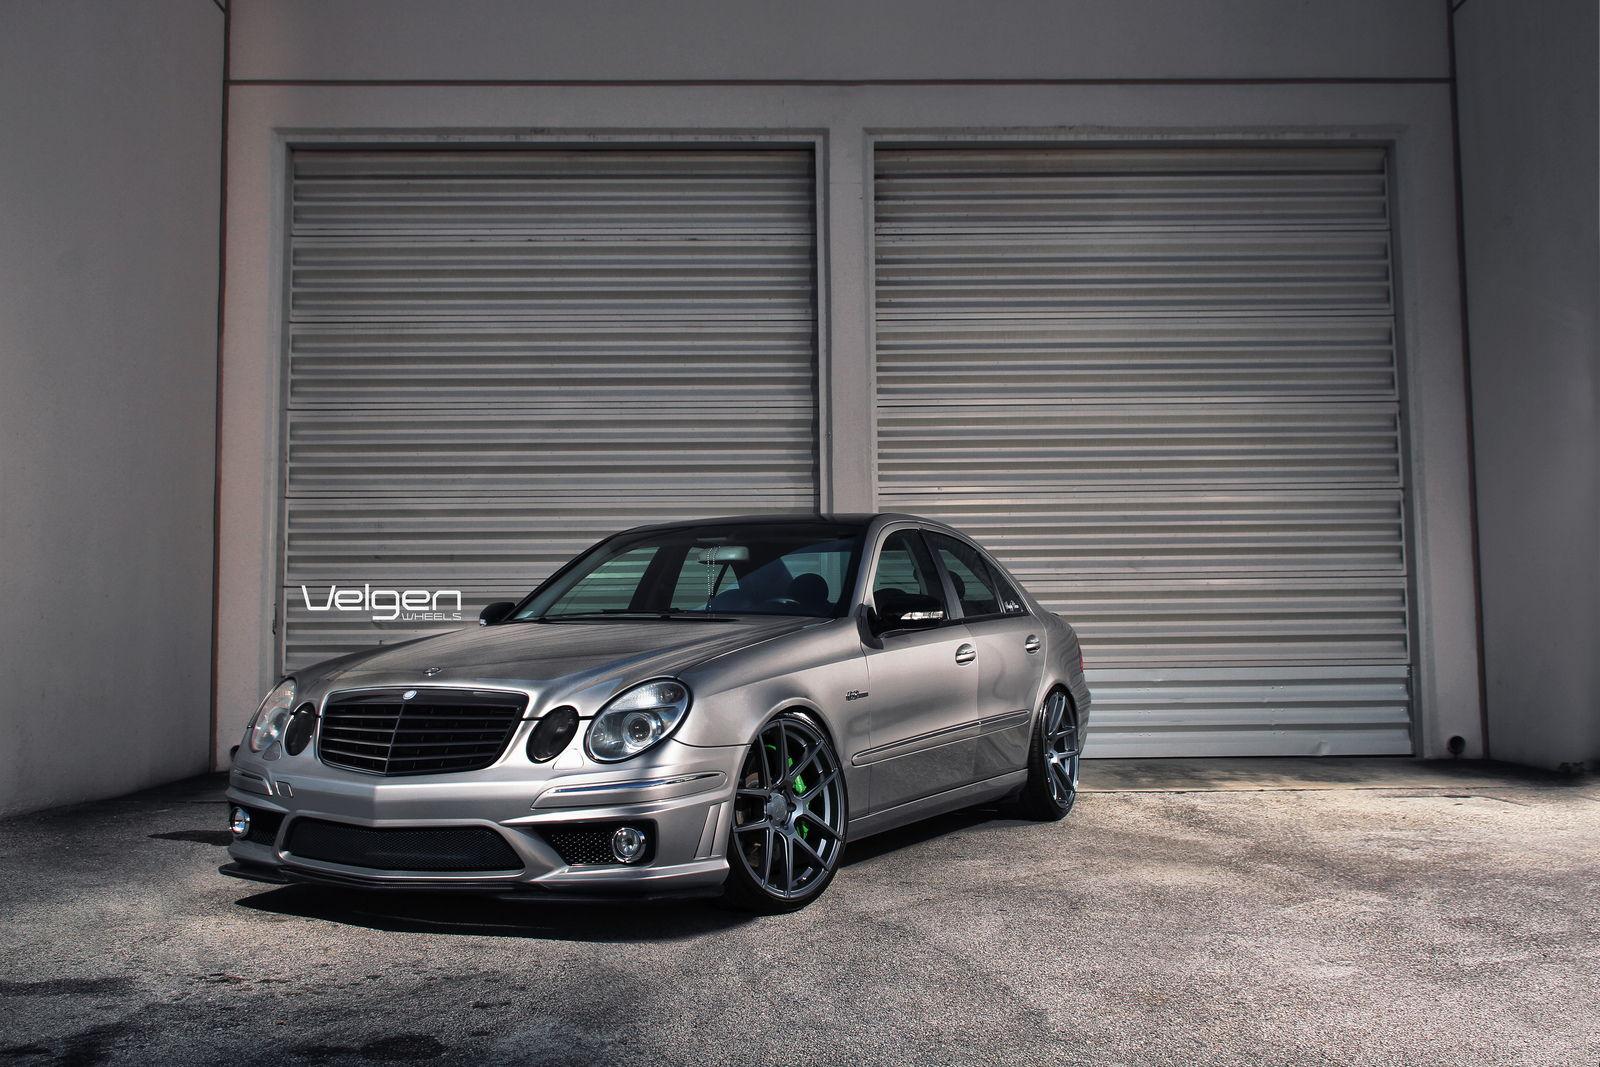 Mercedes benz w211 on velgen wheels 6speedonline for Mercedes benz 6 wheel